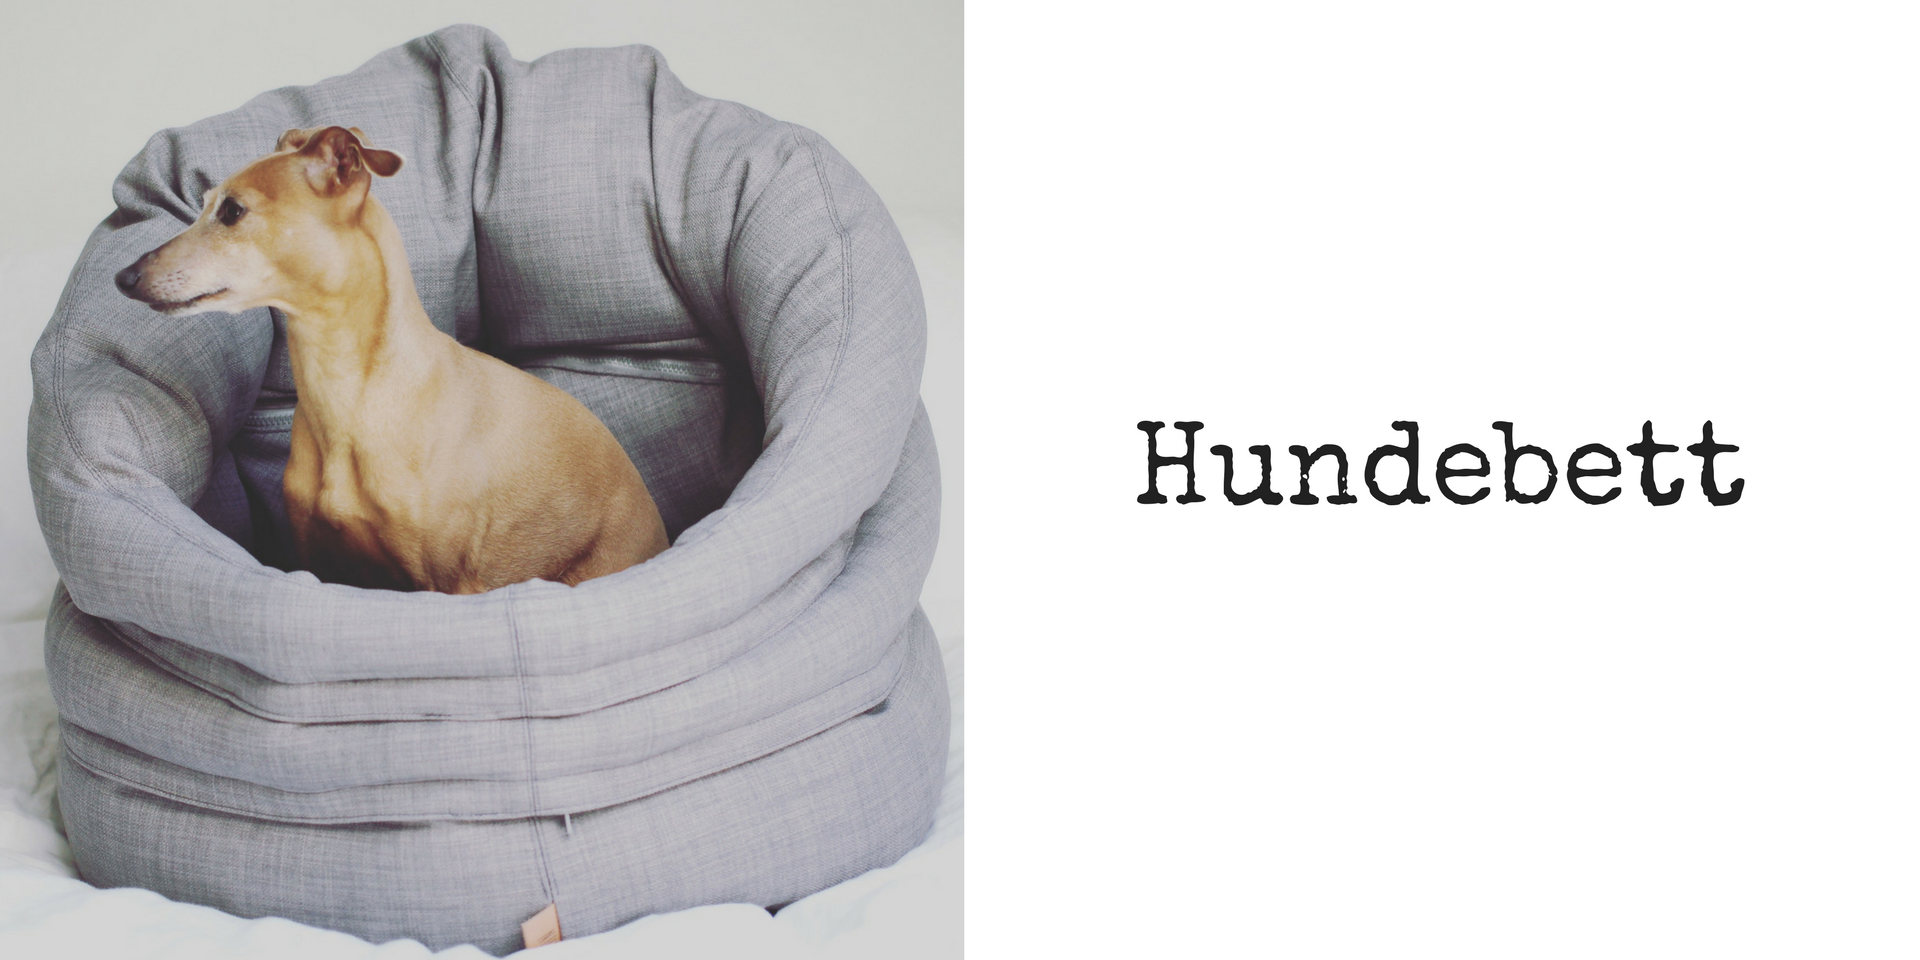 miDoggy Blog Community für Hunde Hundebett